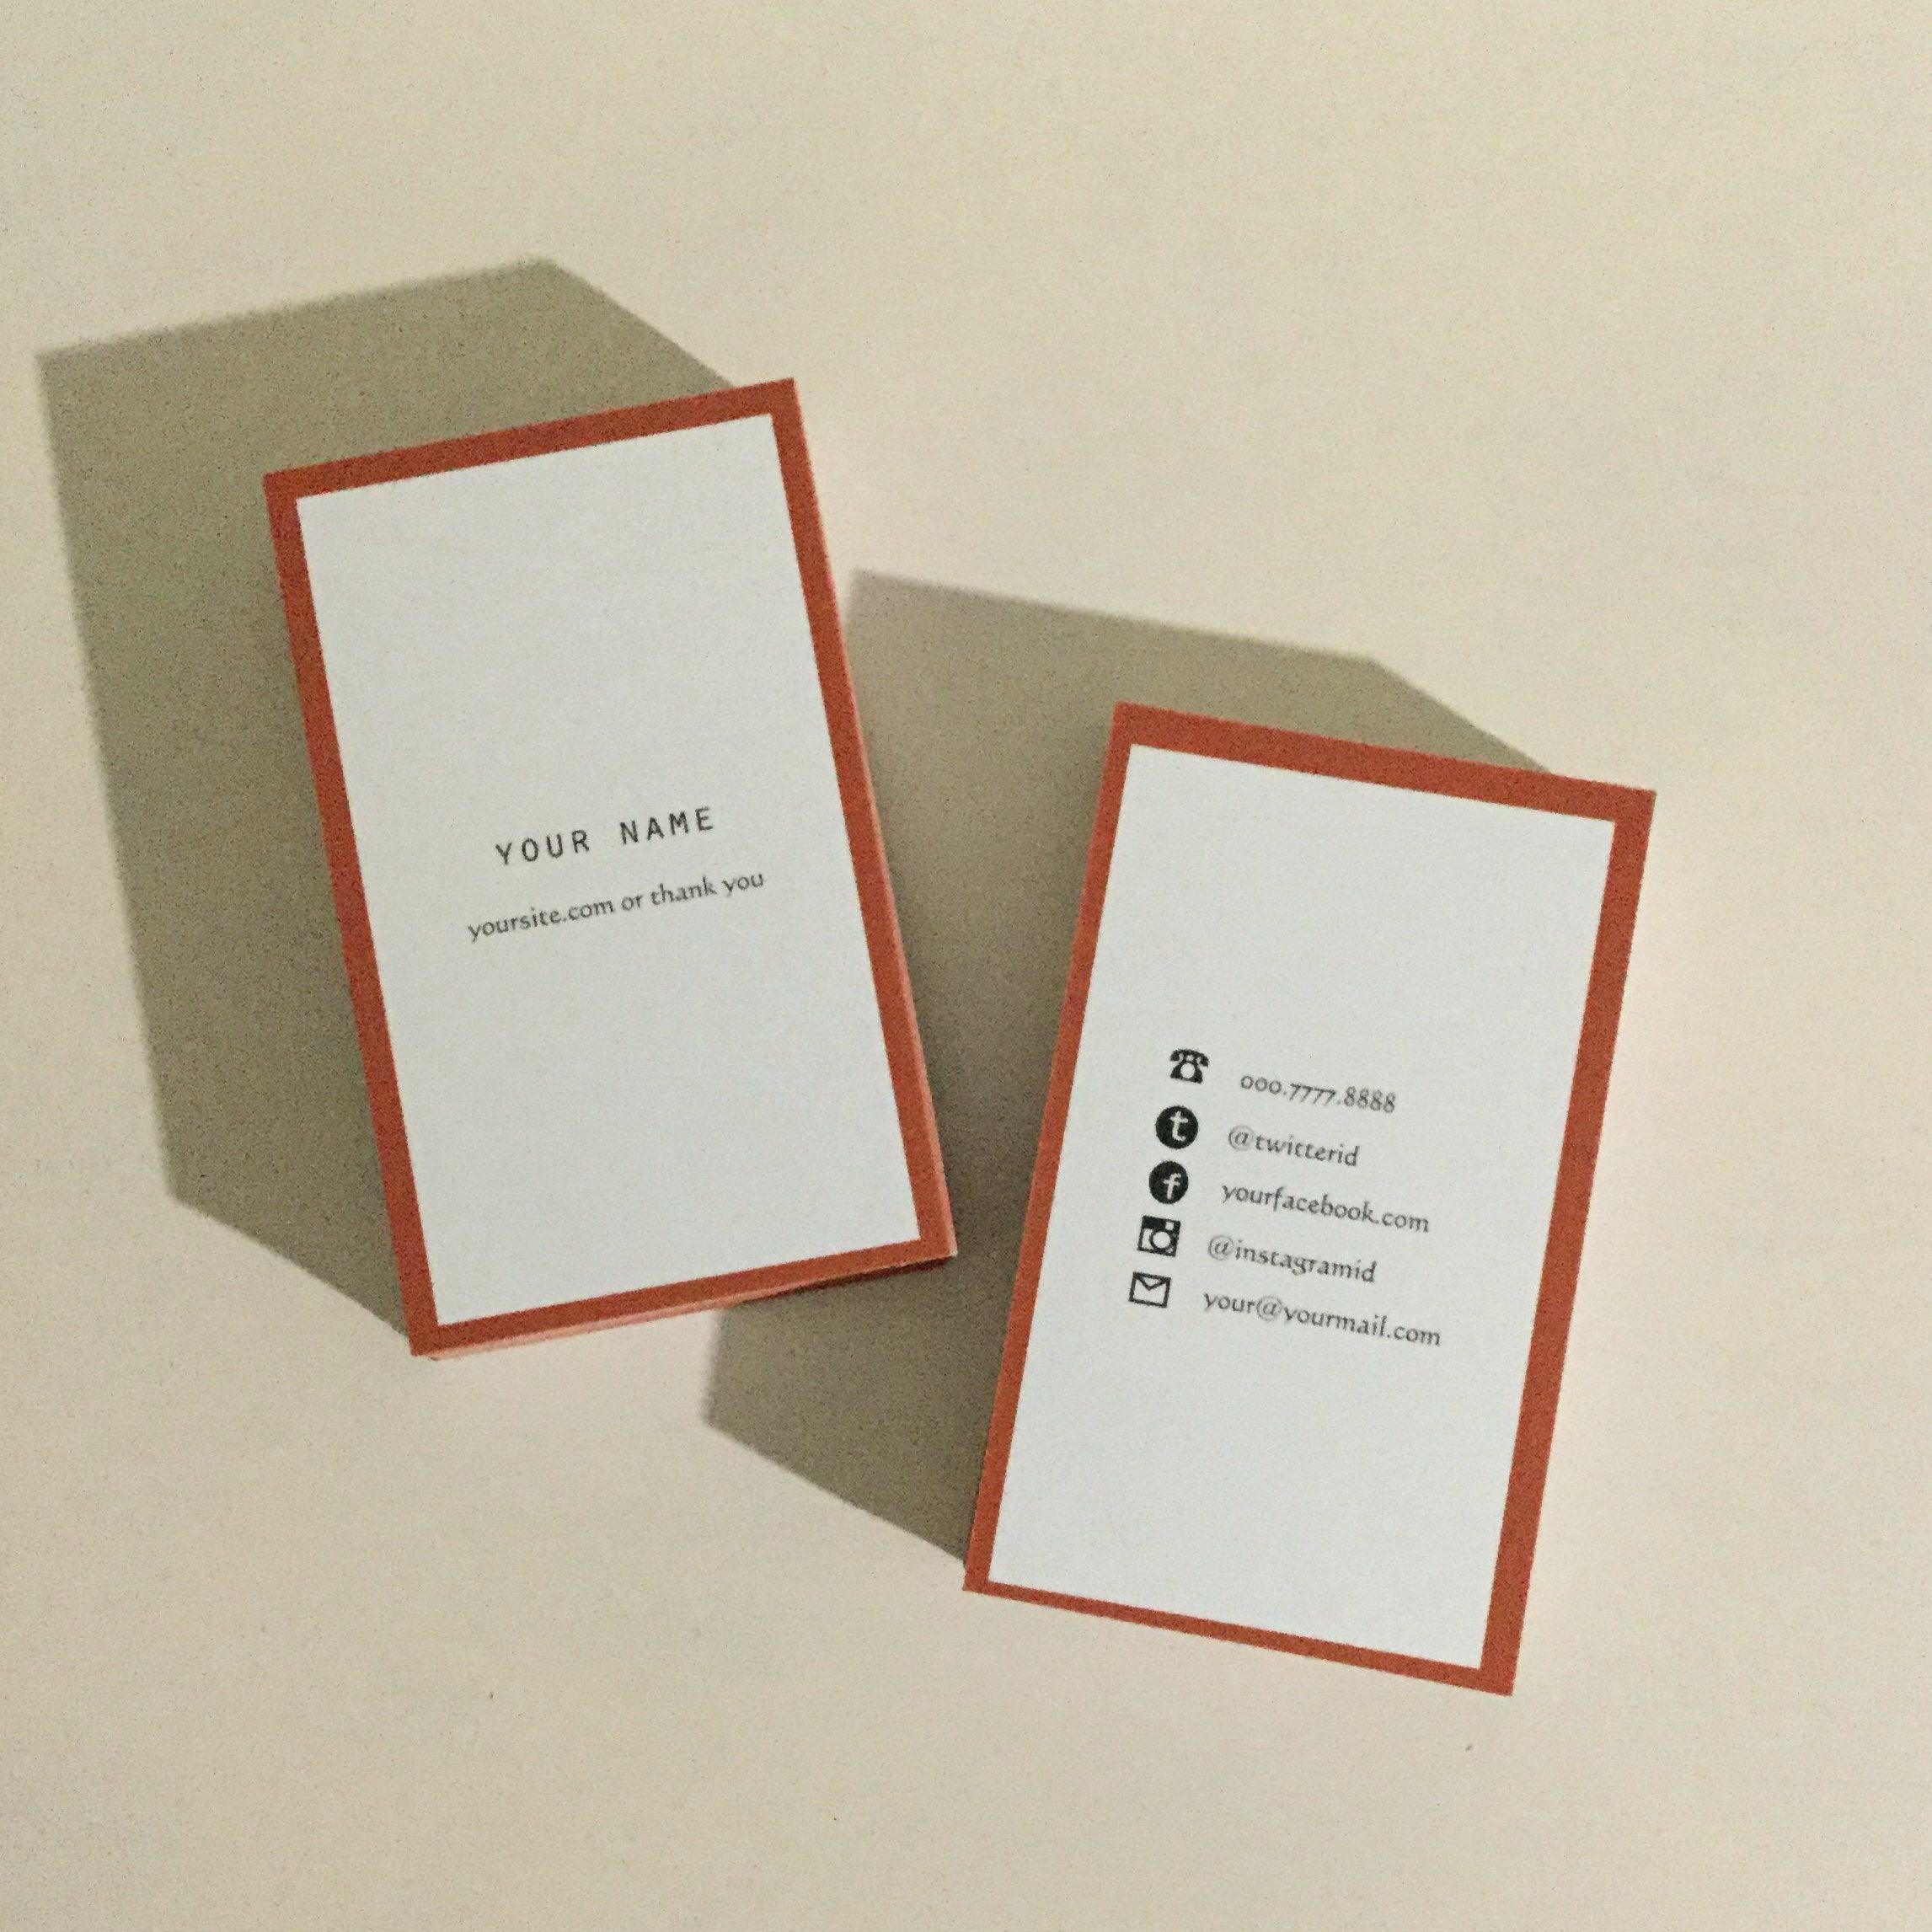 05d5_or【100枚】パーソナル名刺【ショップカード】